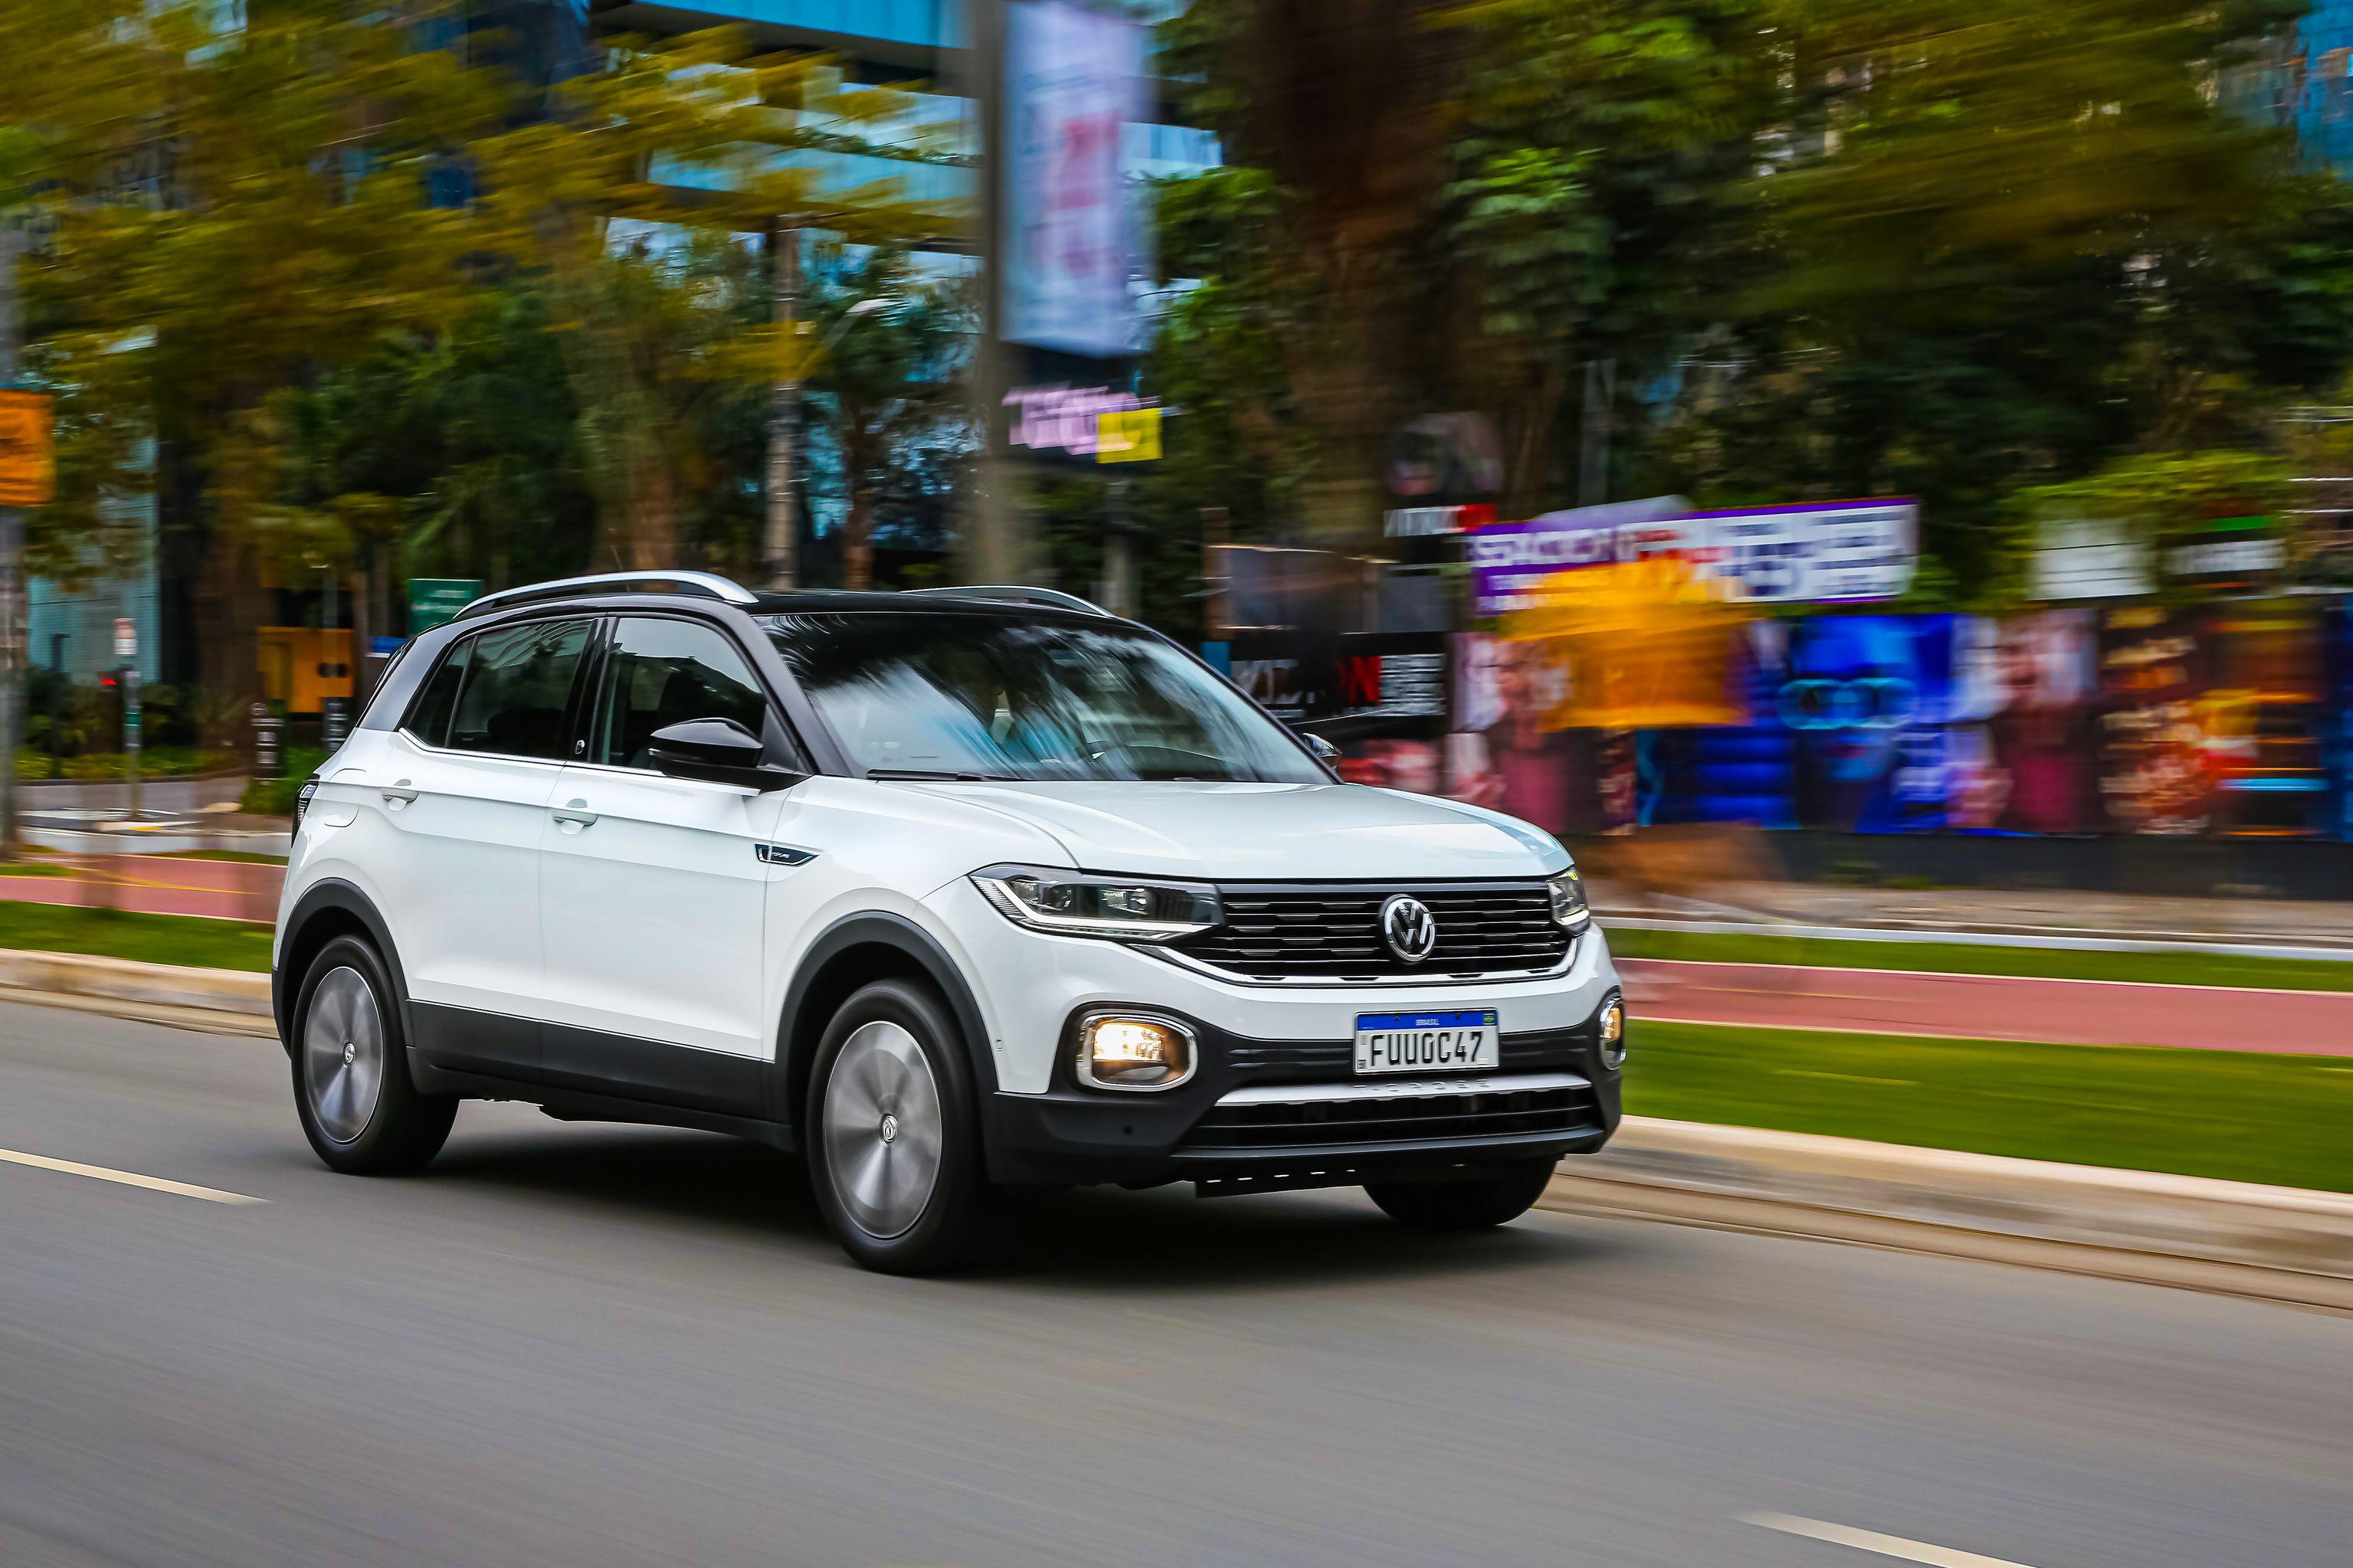 Novo Volkswagen Tiguan X E Um Cayenne Cupe Popular